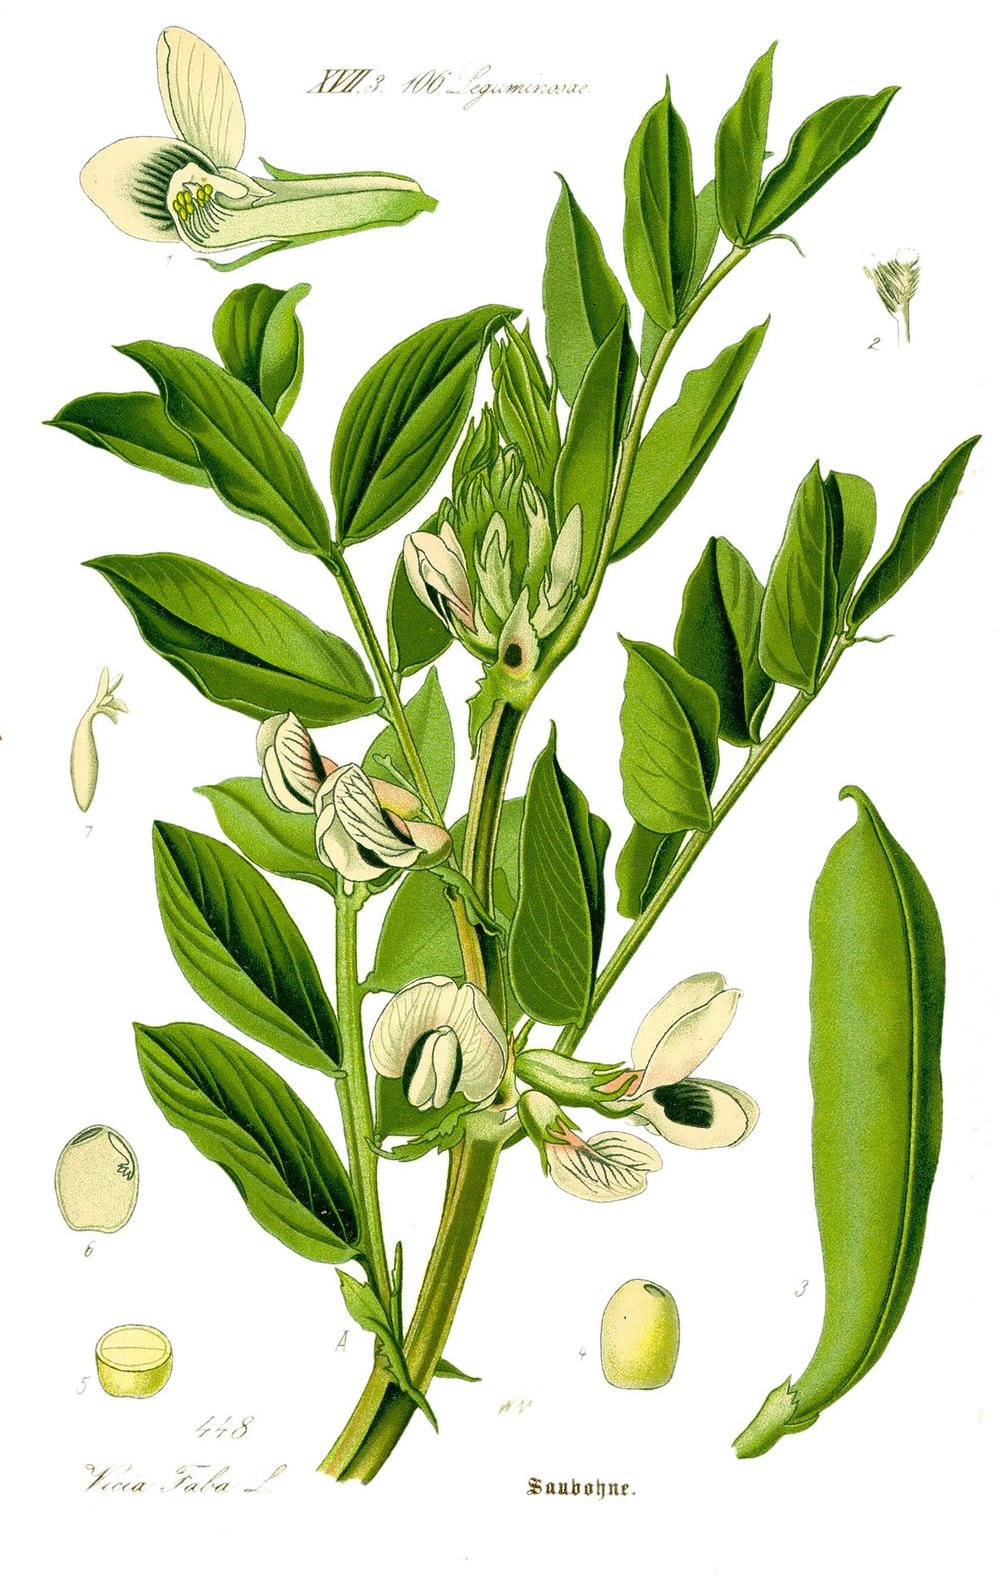 Fava plant